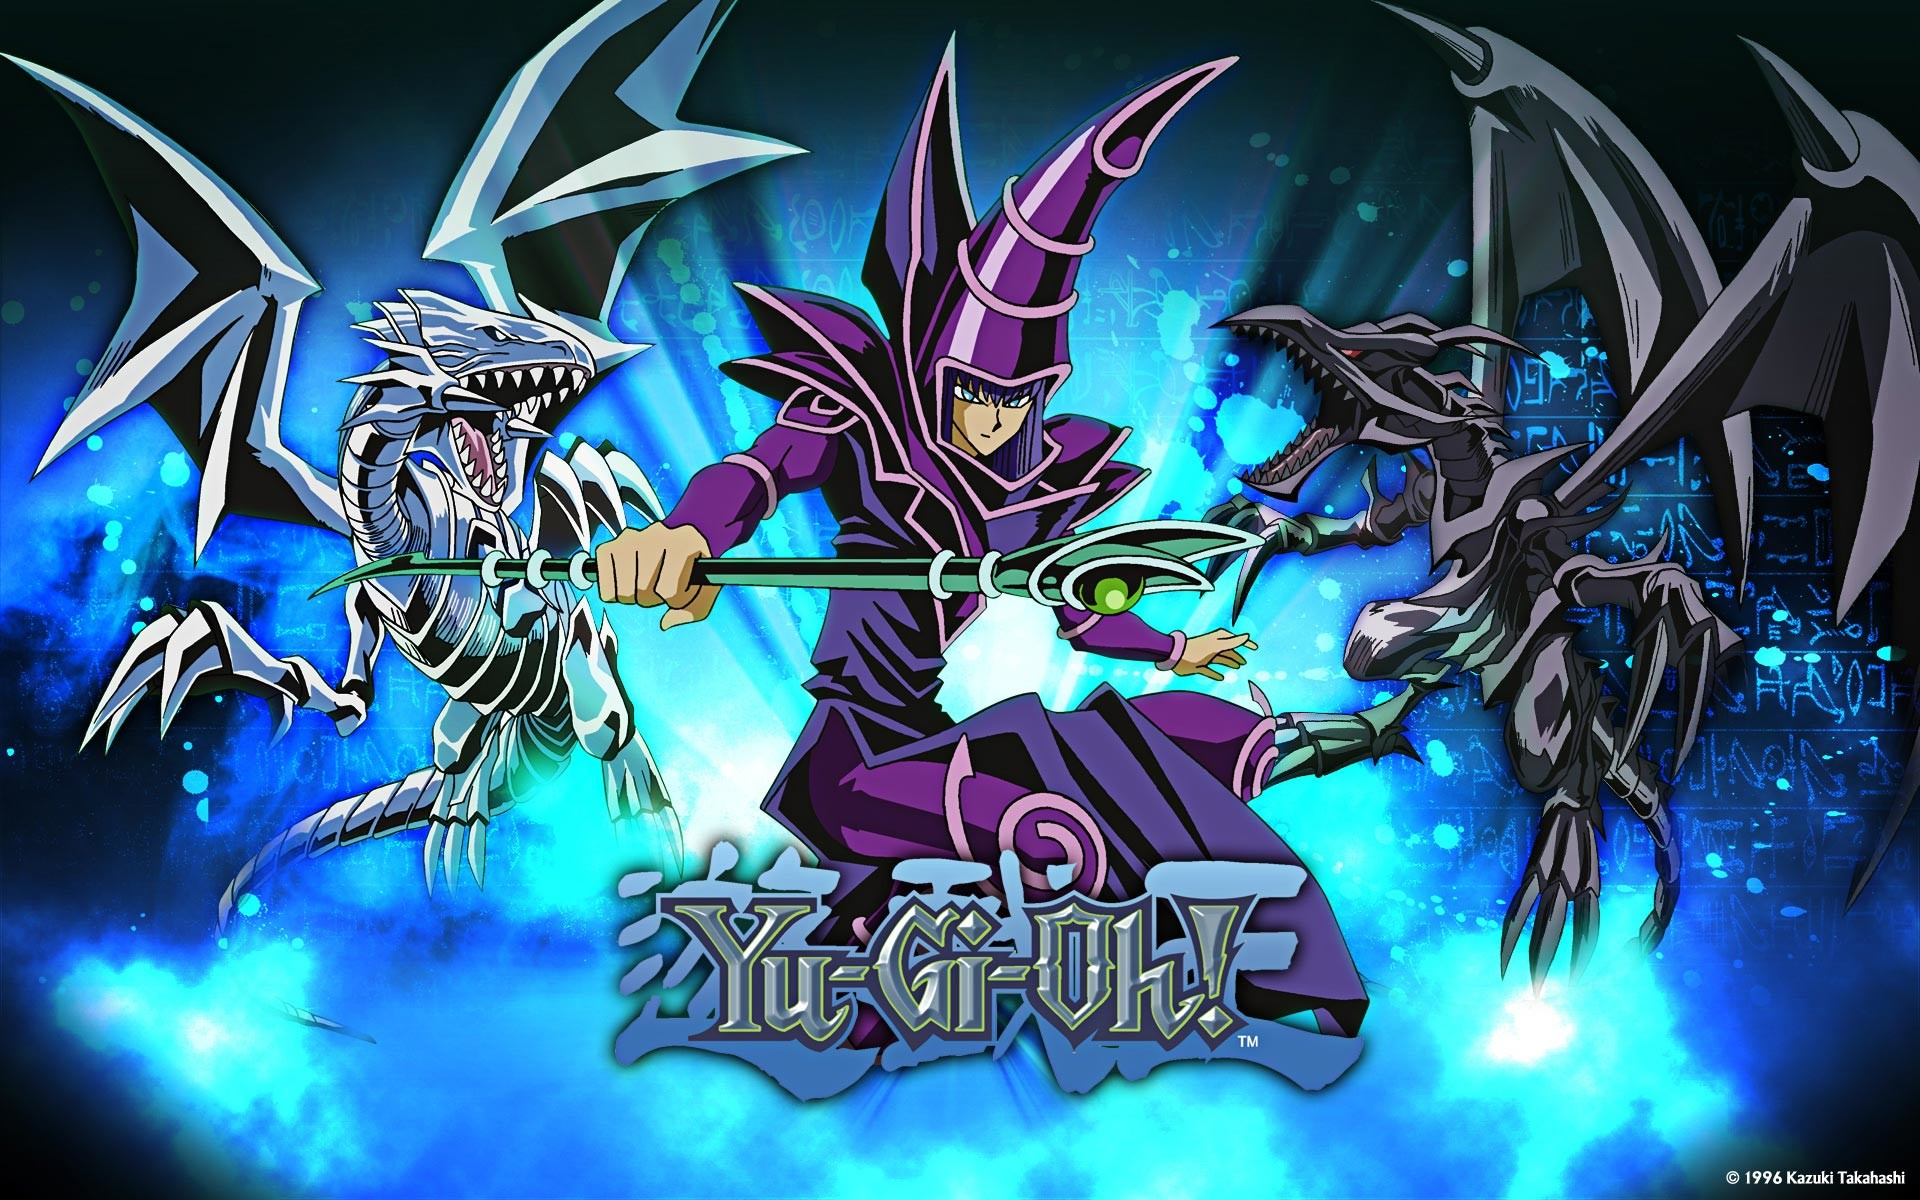 Yu Gi Oh Dark Magician Wallpaper 63 images 1920x1200